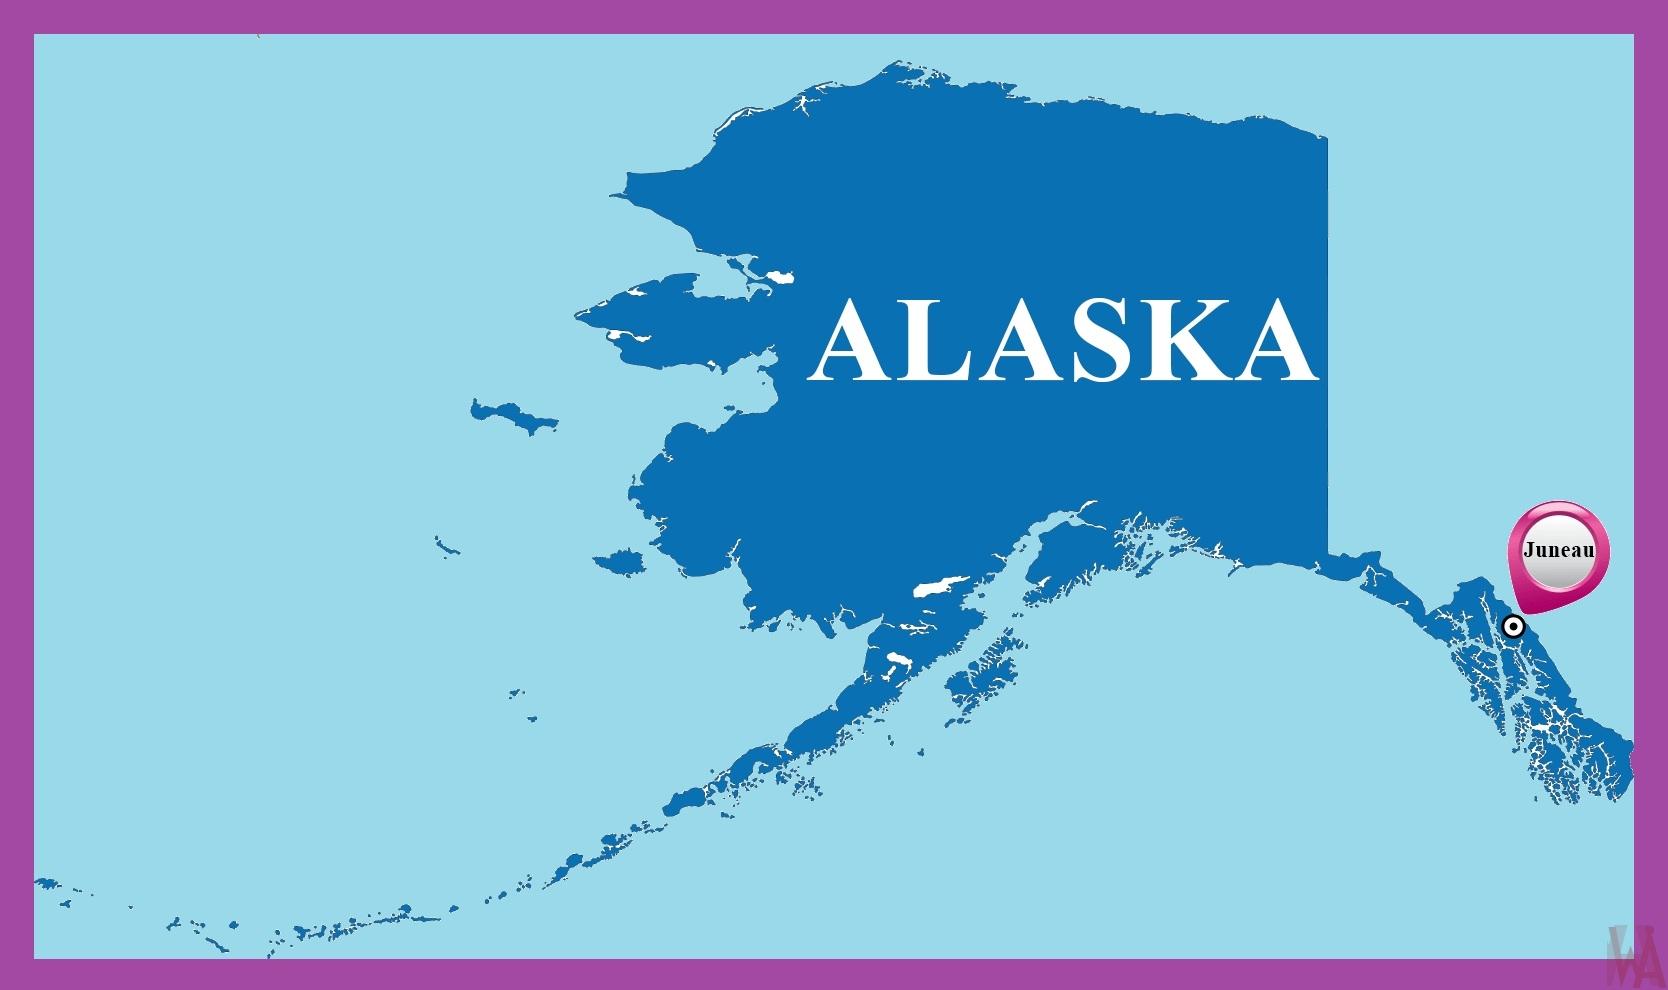 Alaska Capital Map | Capital Map of Alaska | WhatsAnswer on aleutian islands map, inside passage map, alabama map, russia map, california map, colorado map, minnesota map, kodiak island map, wyoming map, hawaiian islands map, nova scotia map, north carolina map, arkansas map, connecticut map, yukon map, indiana map, texas map, arizona map, new york map, illinois map, anchorage map, new mexico map, hawaii map, georgia map, north dakota map, idaho map, pacific map, delaware map, louisiana map, florida map, canada map, michigan map, iowa map, bc map,